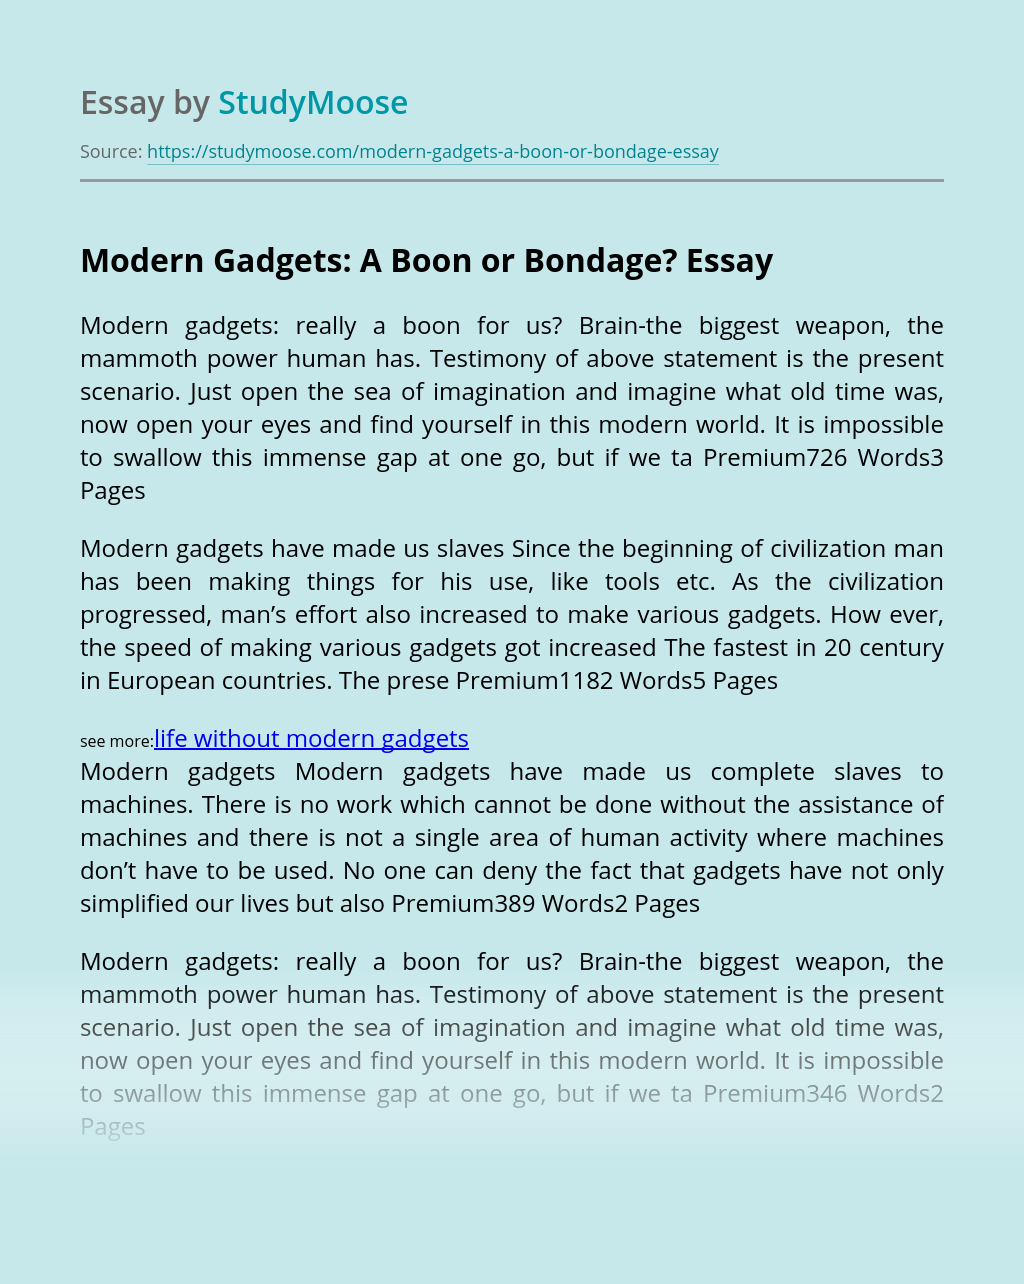 Modern Gadgets: A Boon or Bondage?